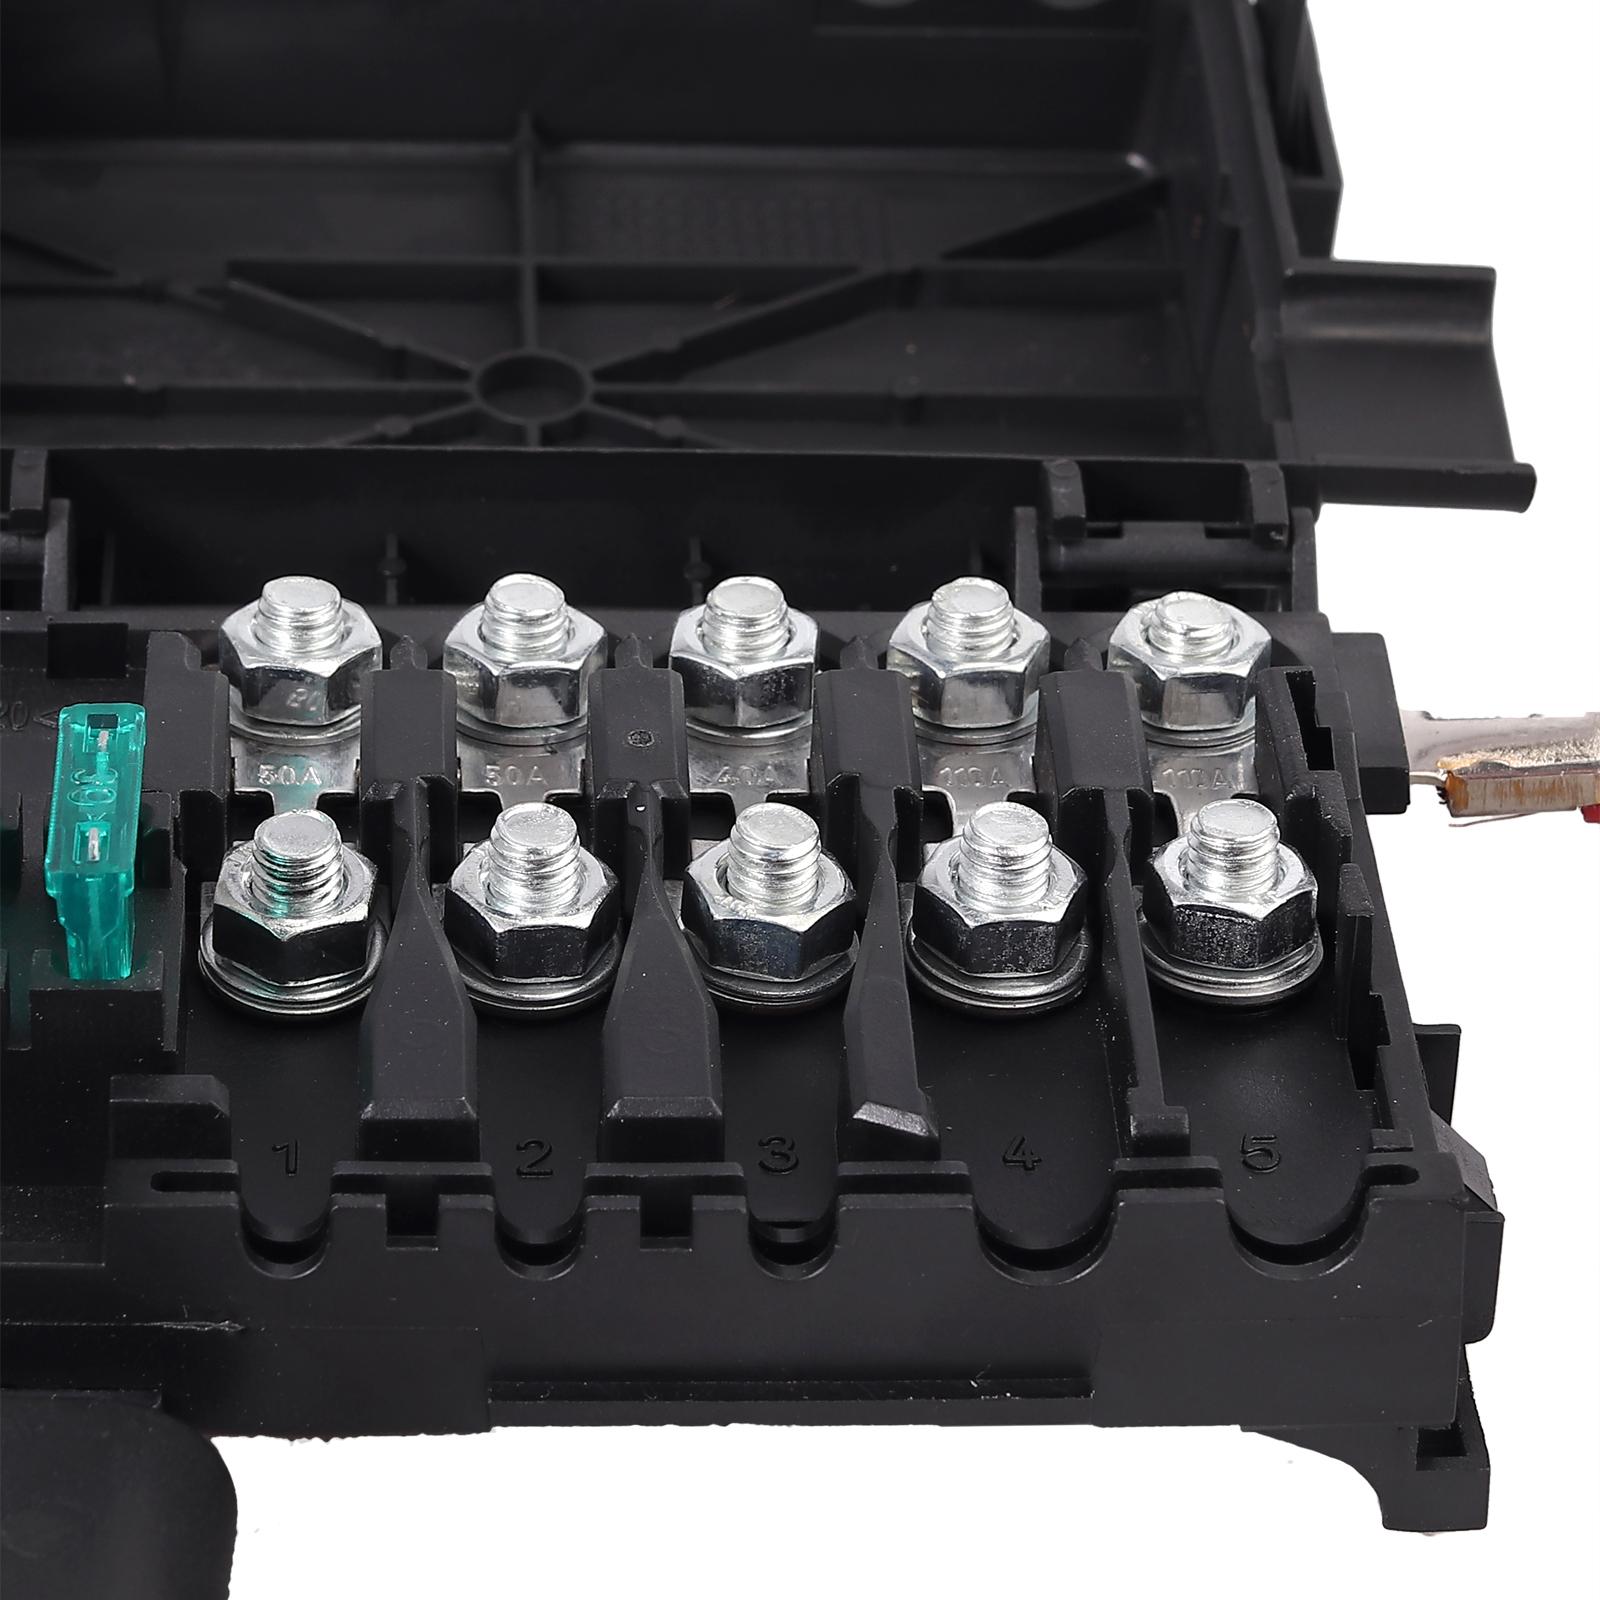 Details about Fuse Box Battery Terminal Can 1J0937550A For VW Jetta on mk4 bora, mk4 slammed, mk4 jetta, 2001 vw golf tdi, mk7 vw golf tdi, mk4 vw golf manual, mk4 golf turbo,